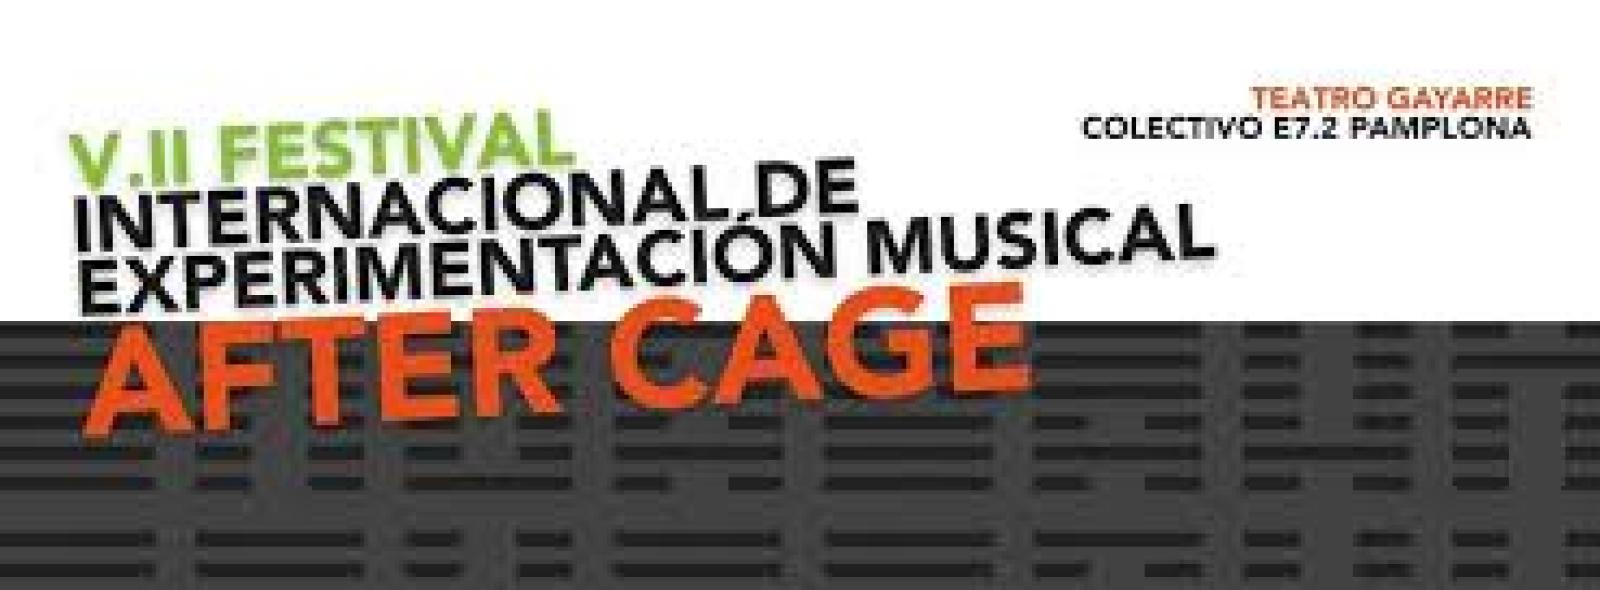 ENTREVISTA FESTIVAL AFTER CAGE 21/10 1490931 2020-10-21t10-00-24000 - escuchar ahora